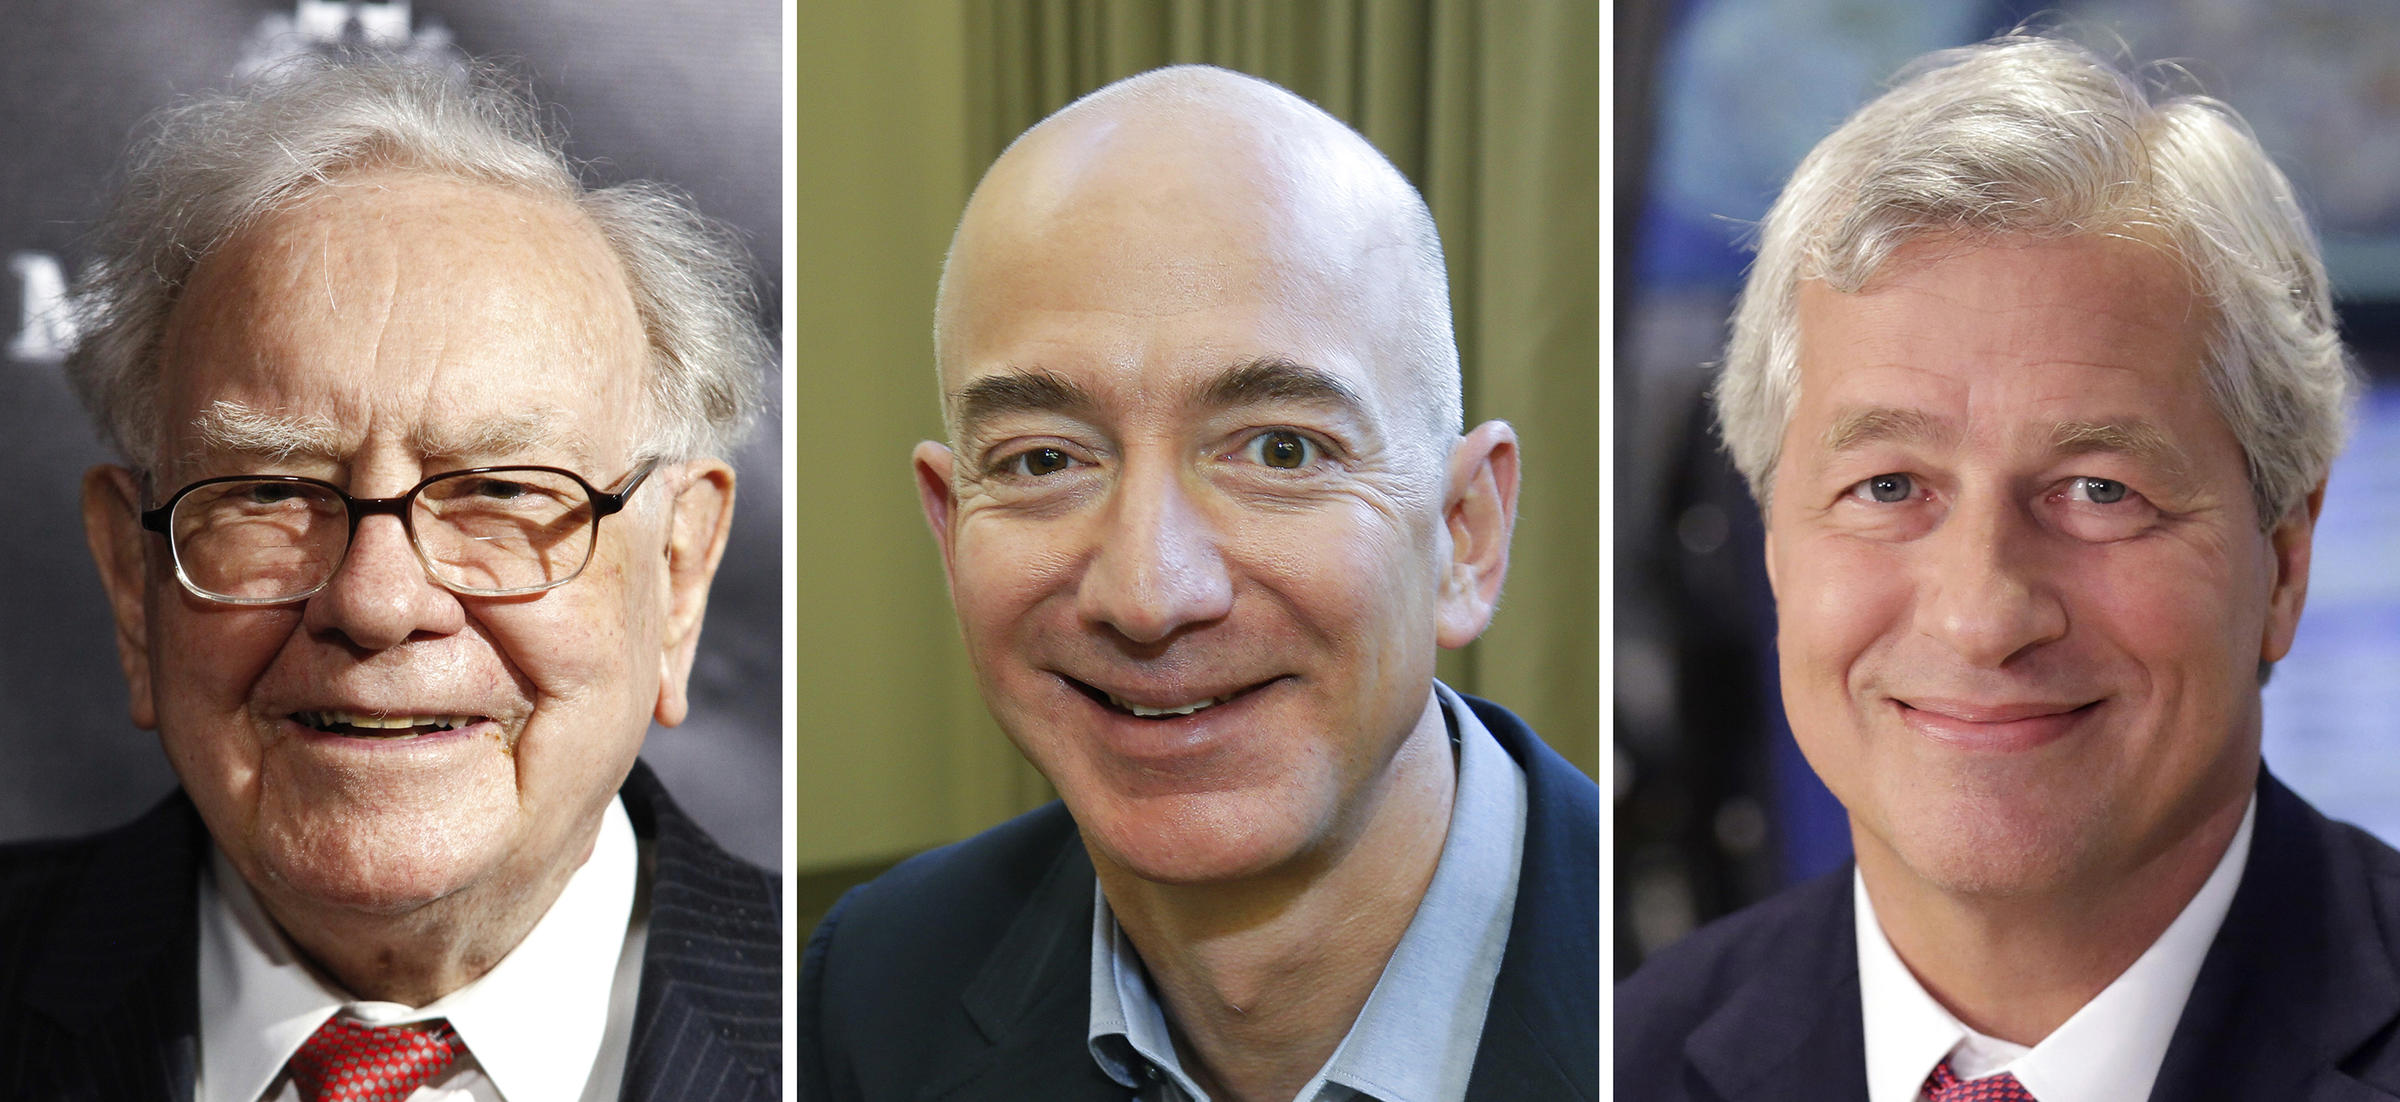 Discussion on this topic: Amazon, JPMorgan, and Berkshire Hathaway health joint , amazon-jpmorgan-and-berkshire-hathaway-health-joint/